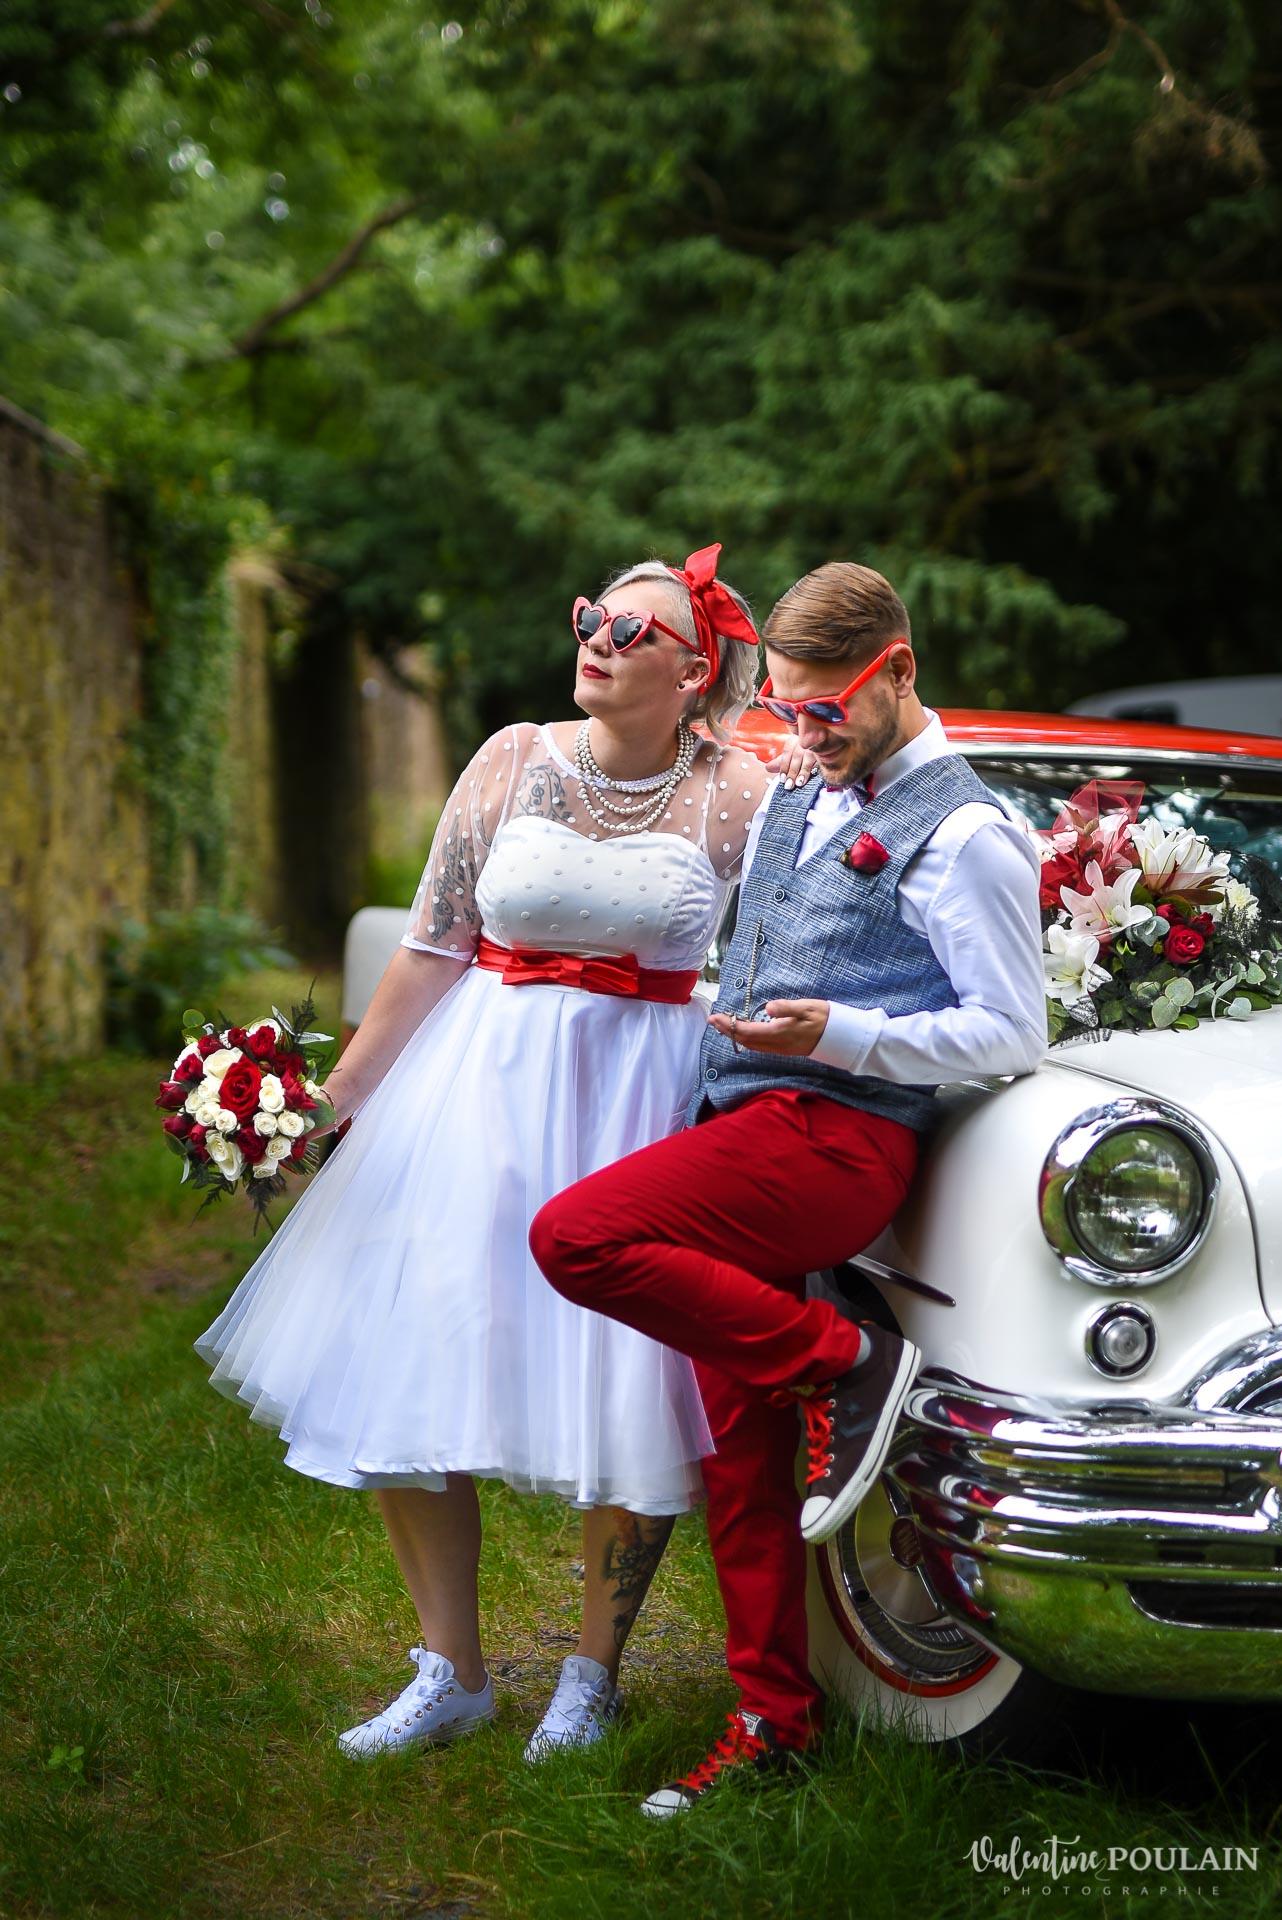 Mariage vintage rockabilly - Valentine Poulain couple regards voiture